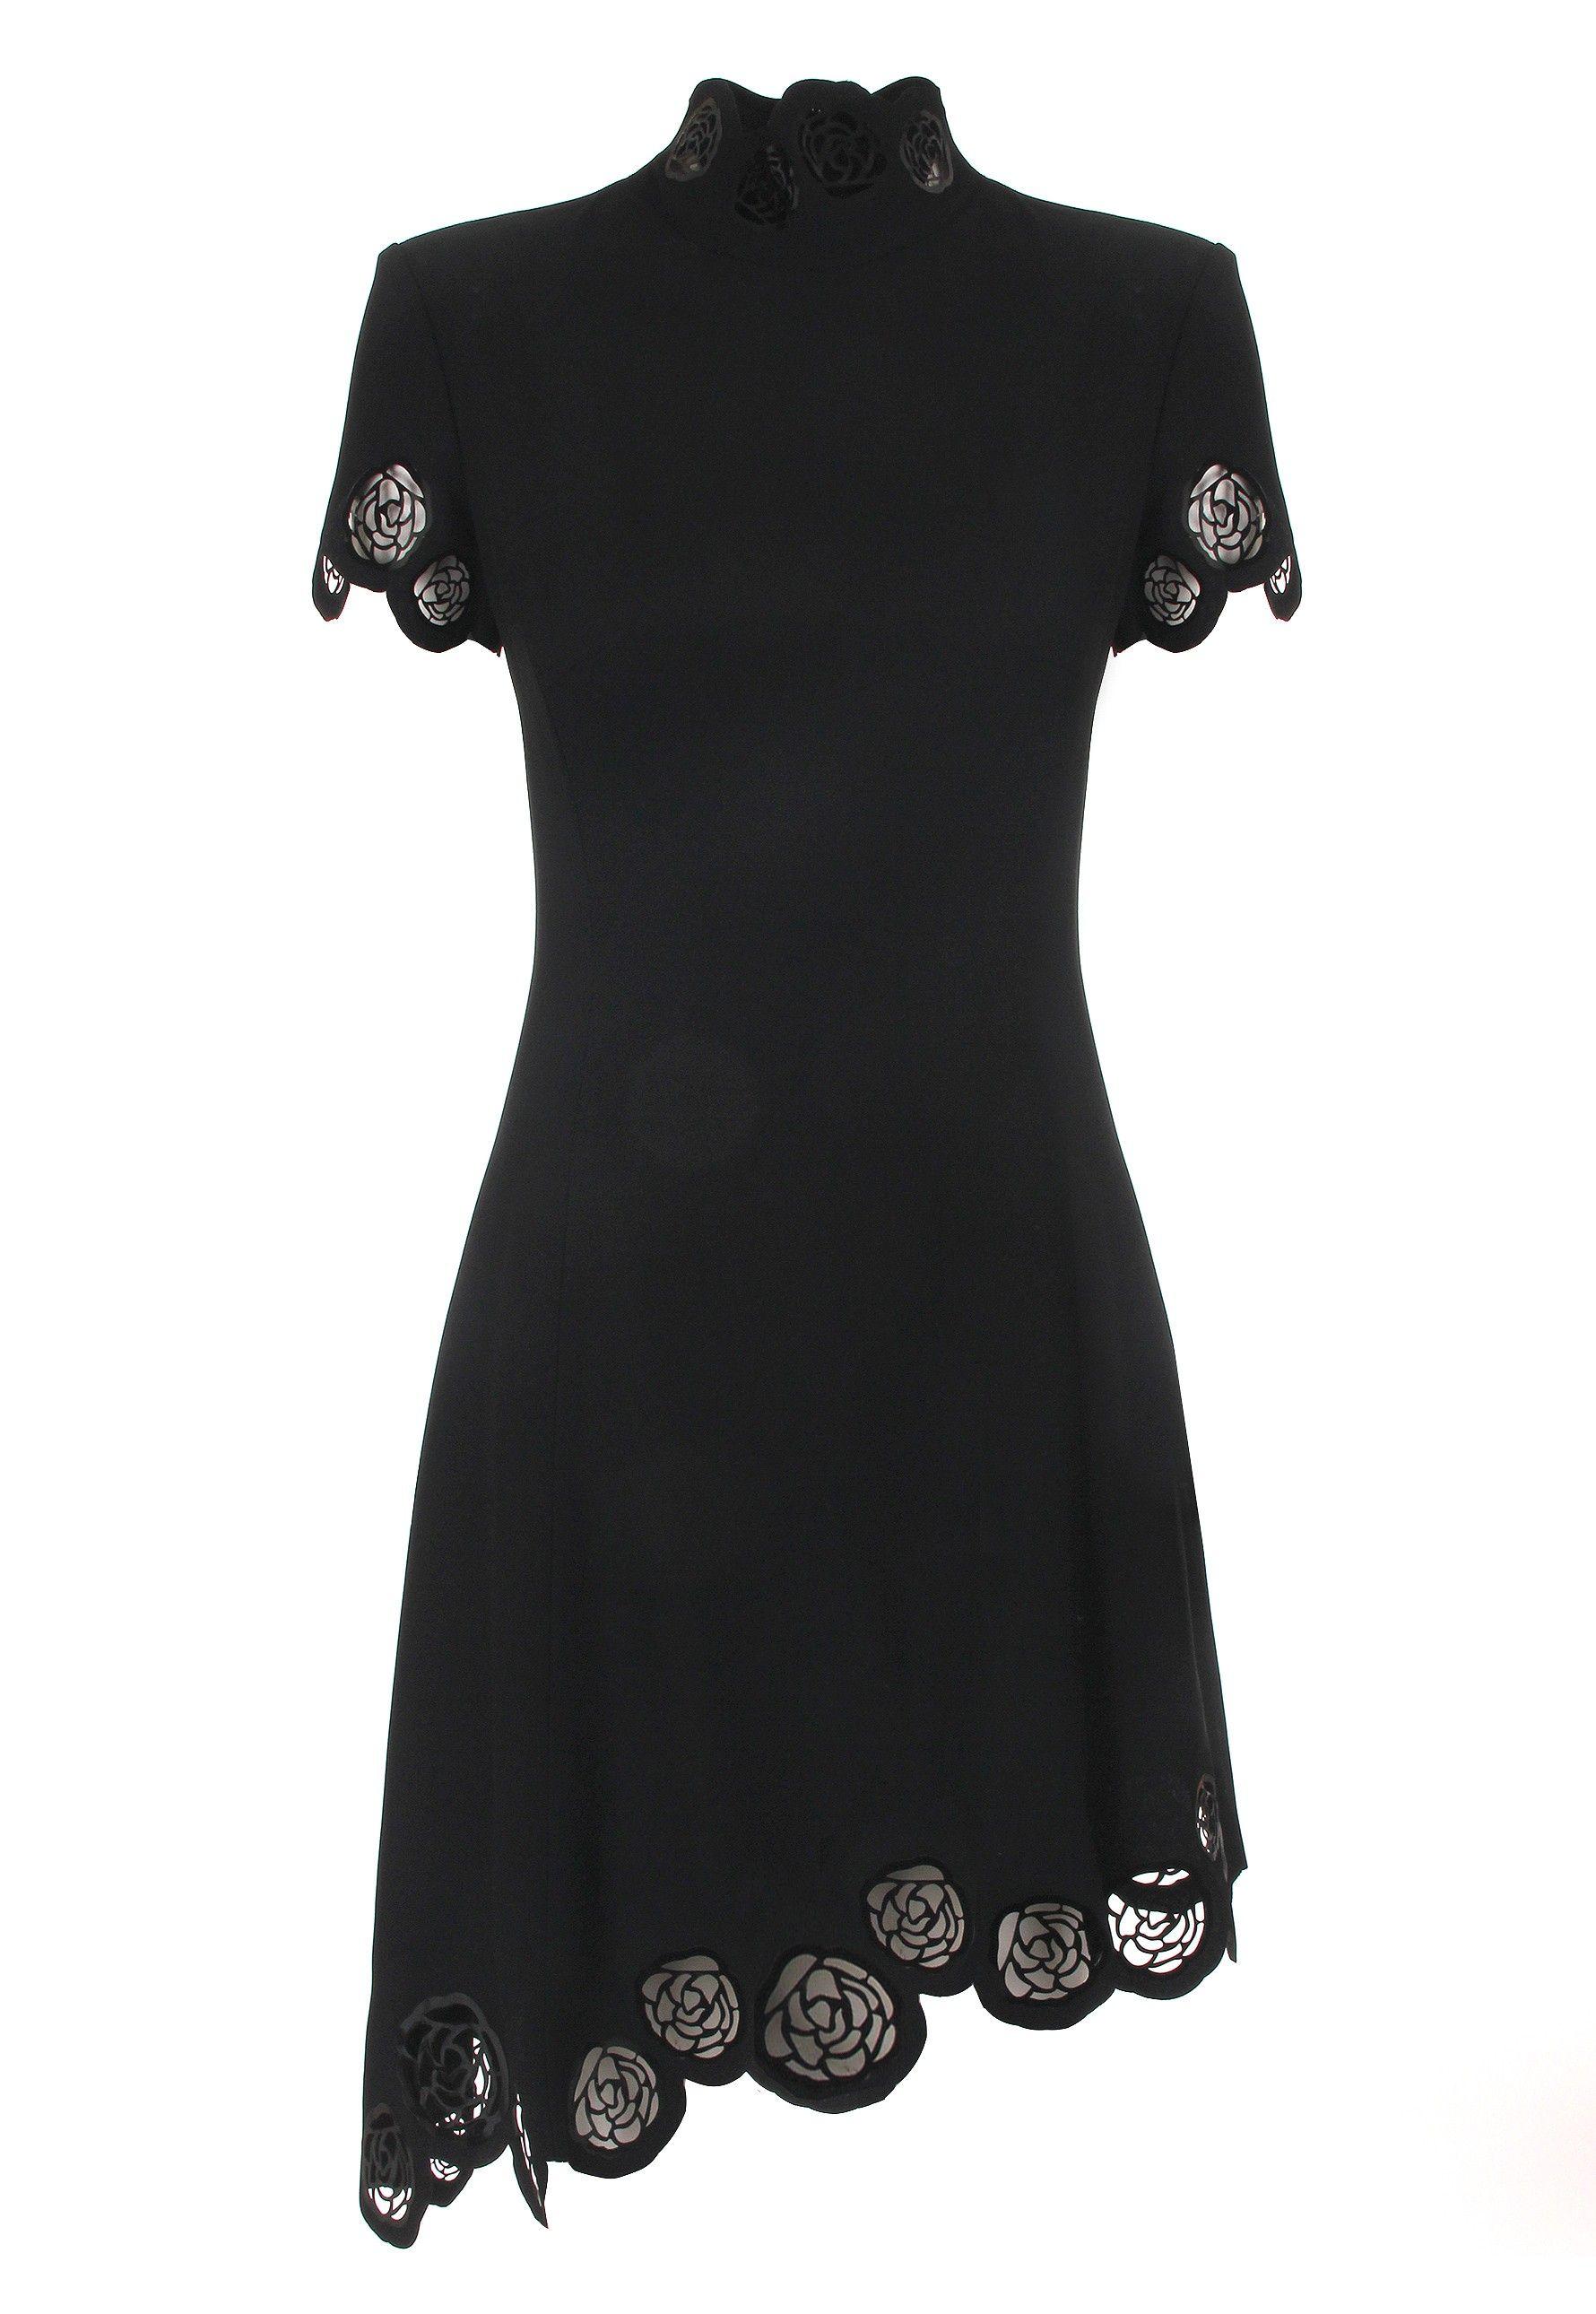 Versace Woman Zip-detailed Cutout Crepe Dress Black Size 42 Versace Cheap View Marketable Online Professional Cheap Online Finishline Cheap Price A5hSHhM